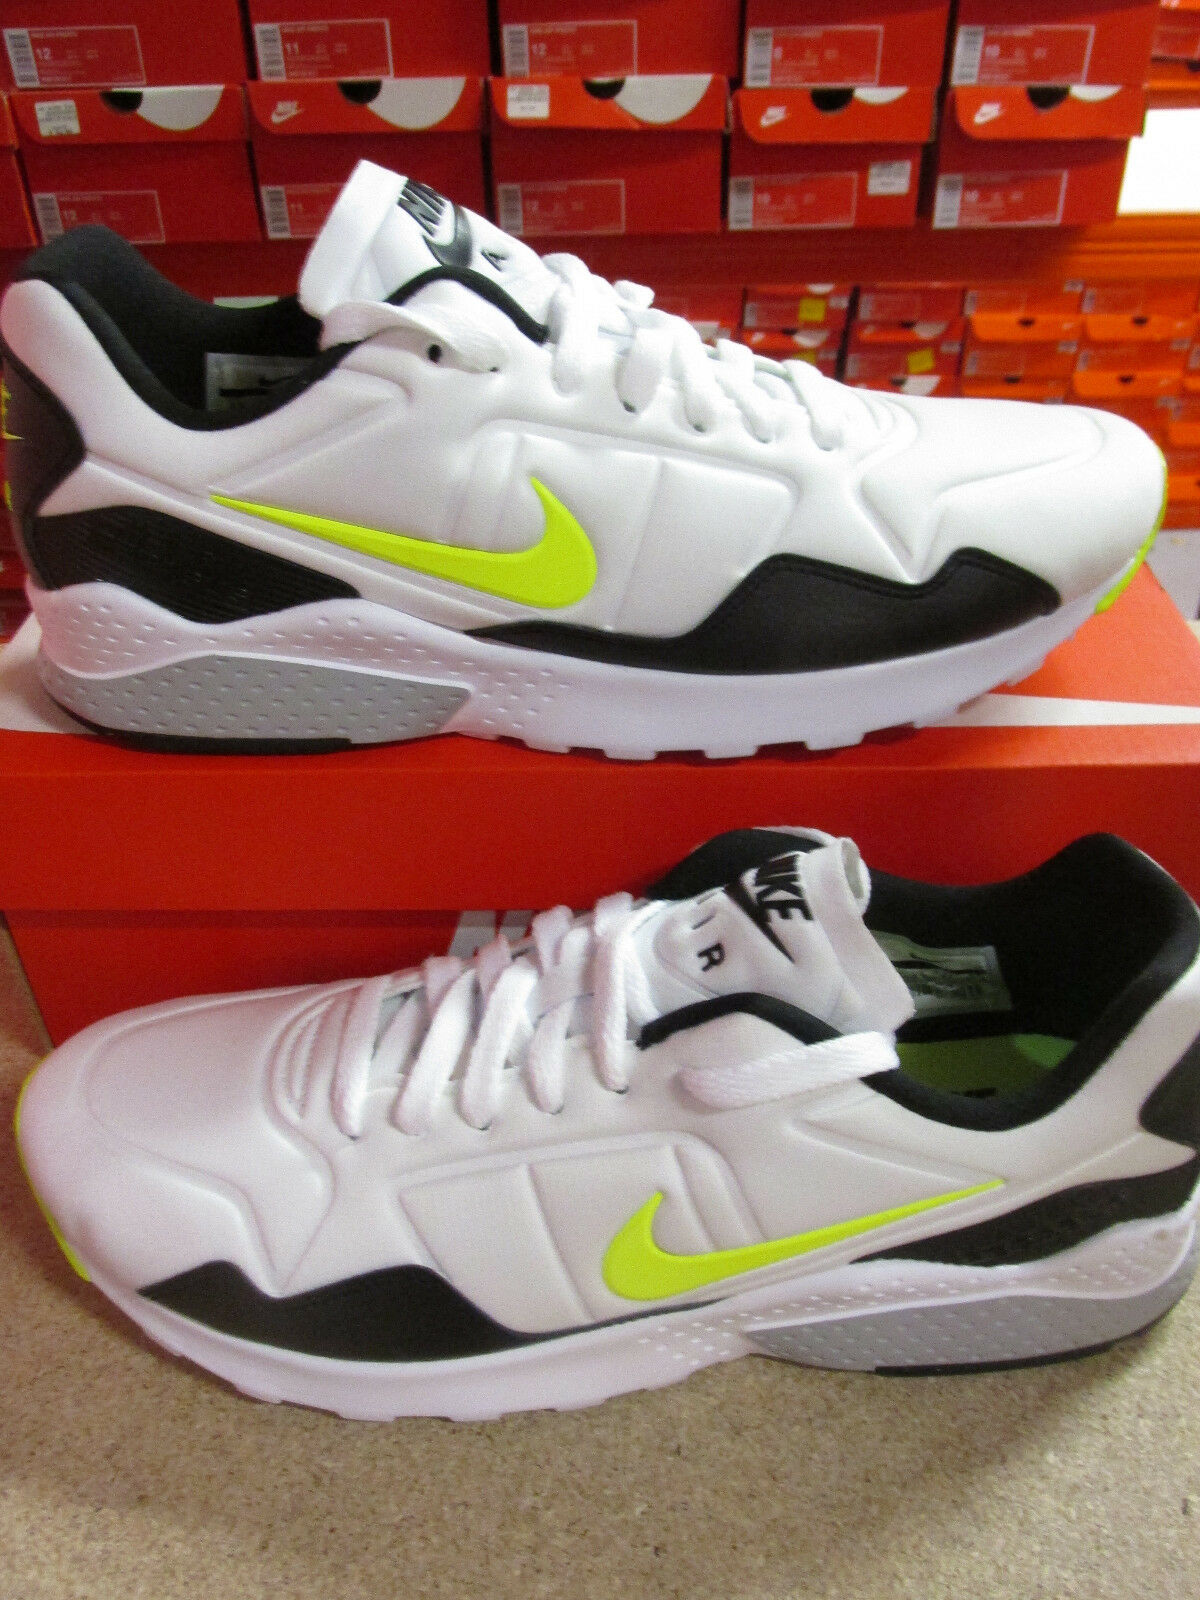 Nike Air Zoom Pegasus 92 Mens Running Trainers 844652 101 Sneakers Shoes